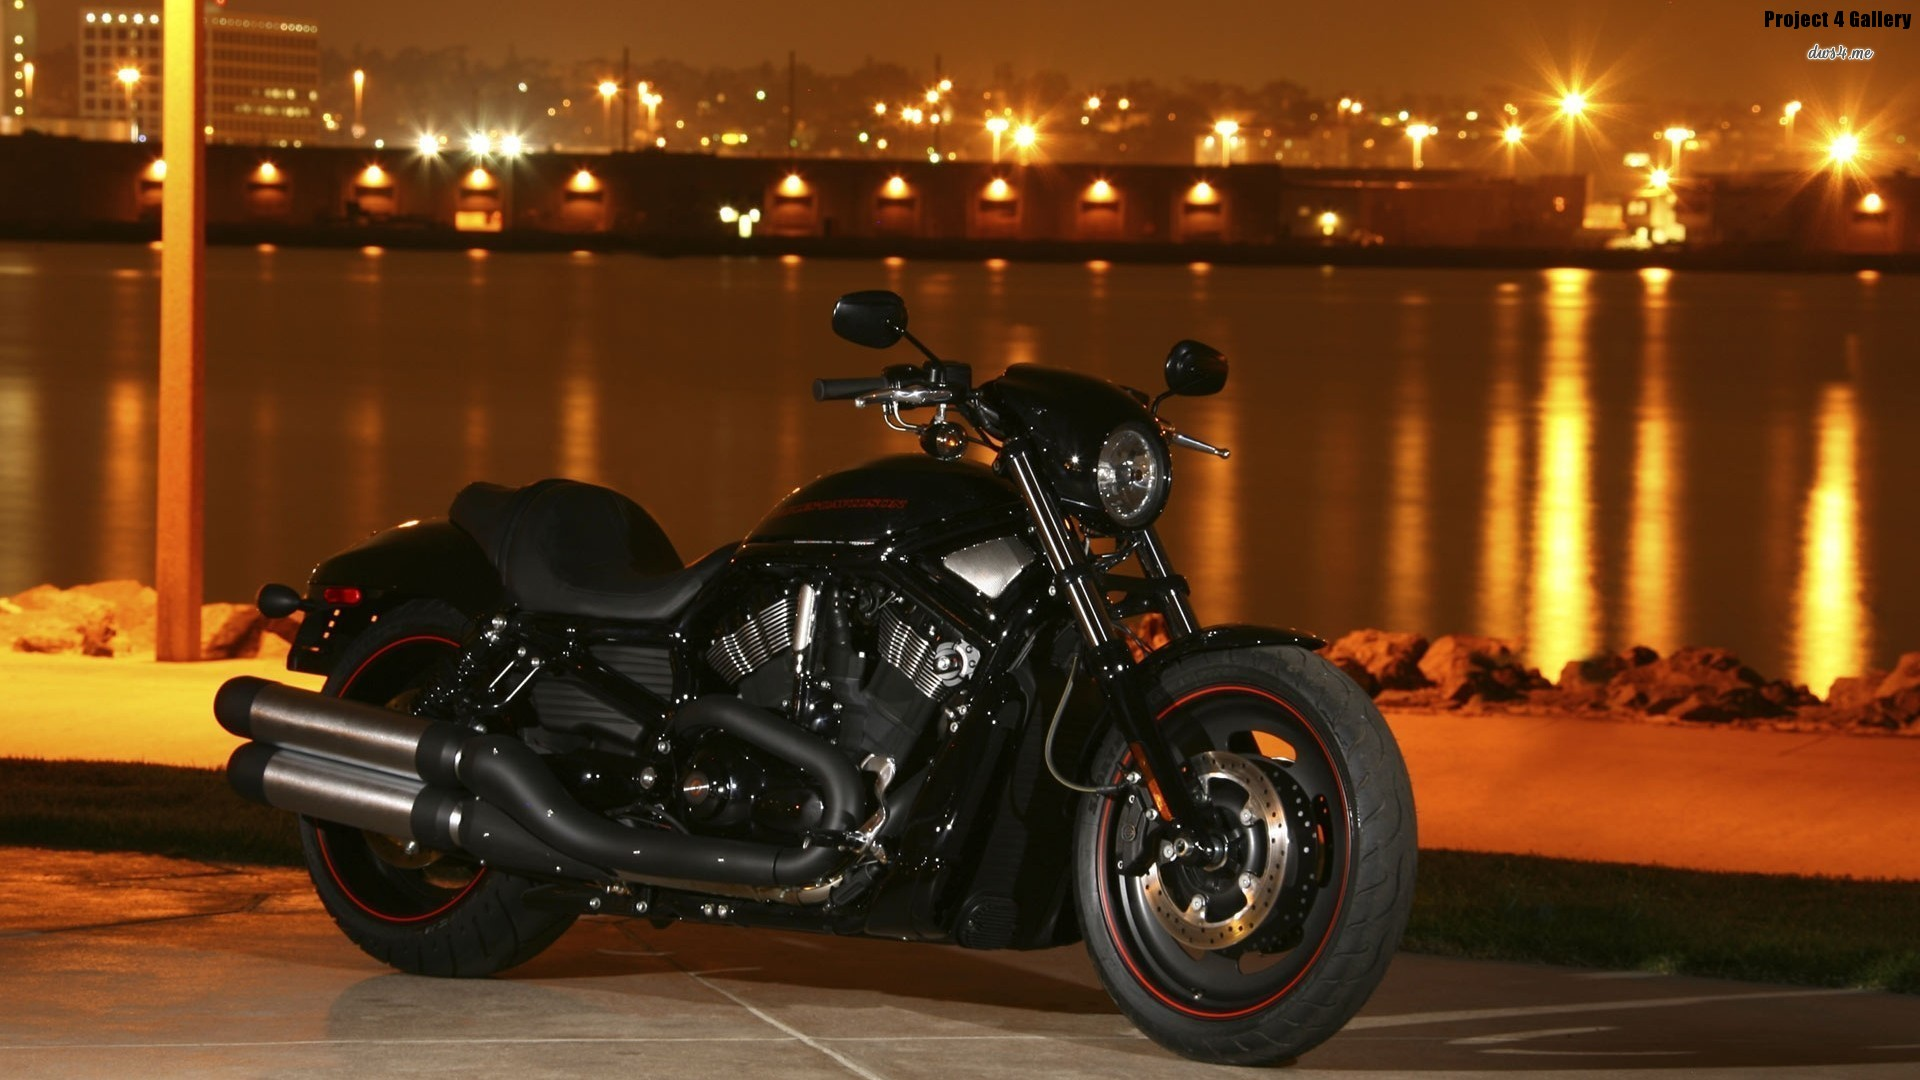 Harley-Davidson-iPhone-wallpaper-wpc9205712